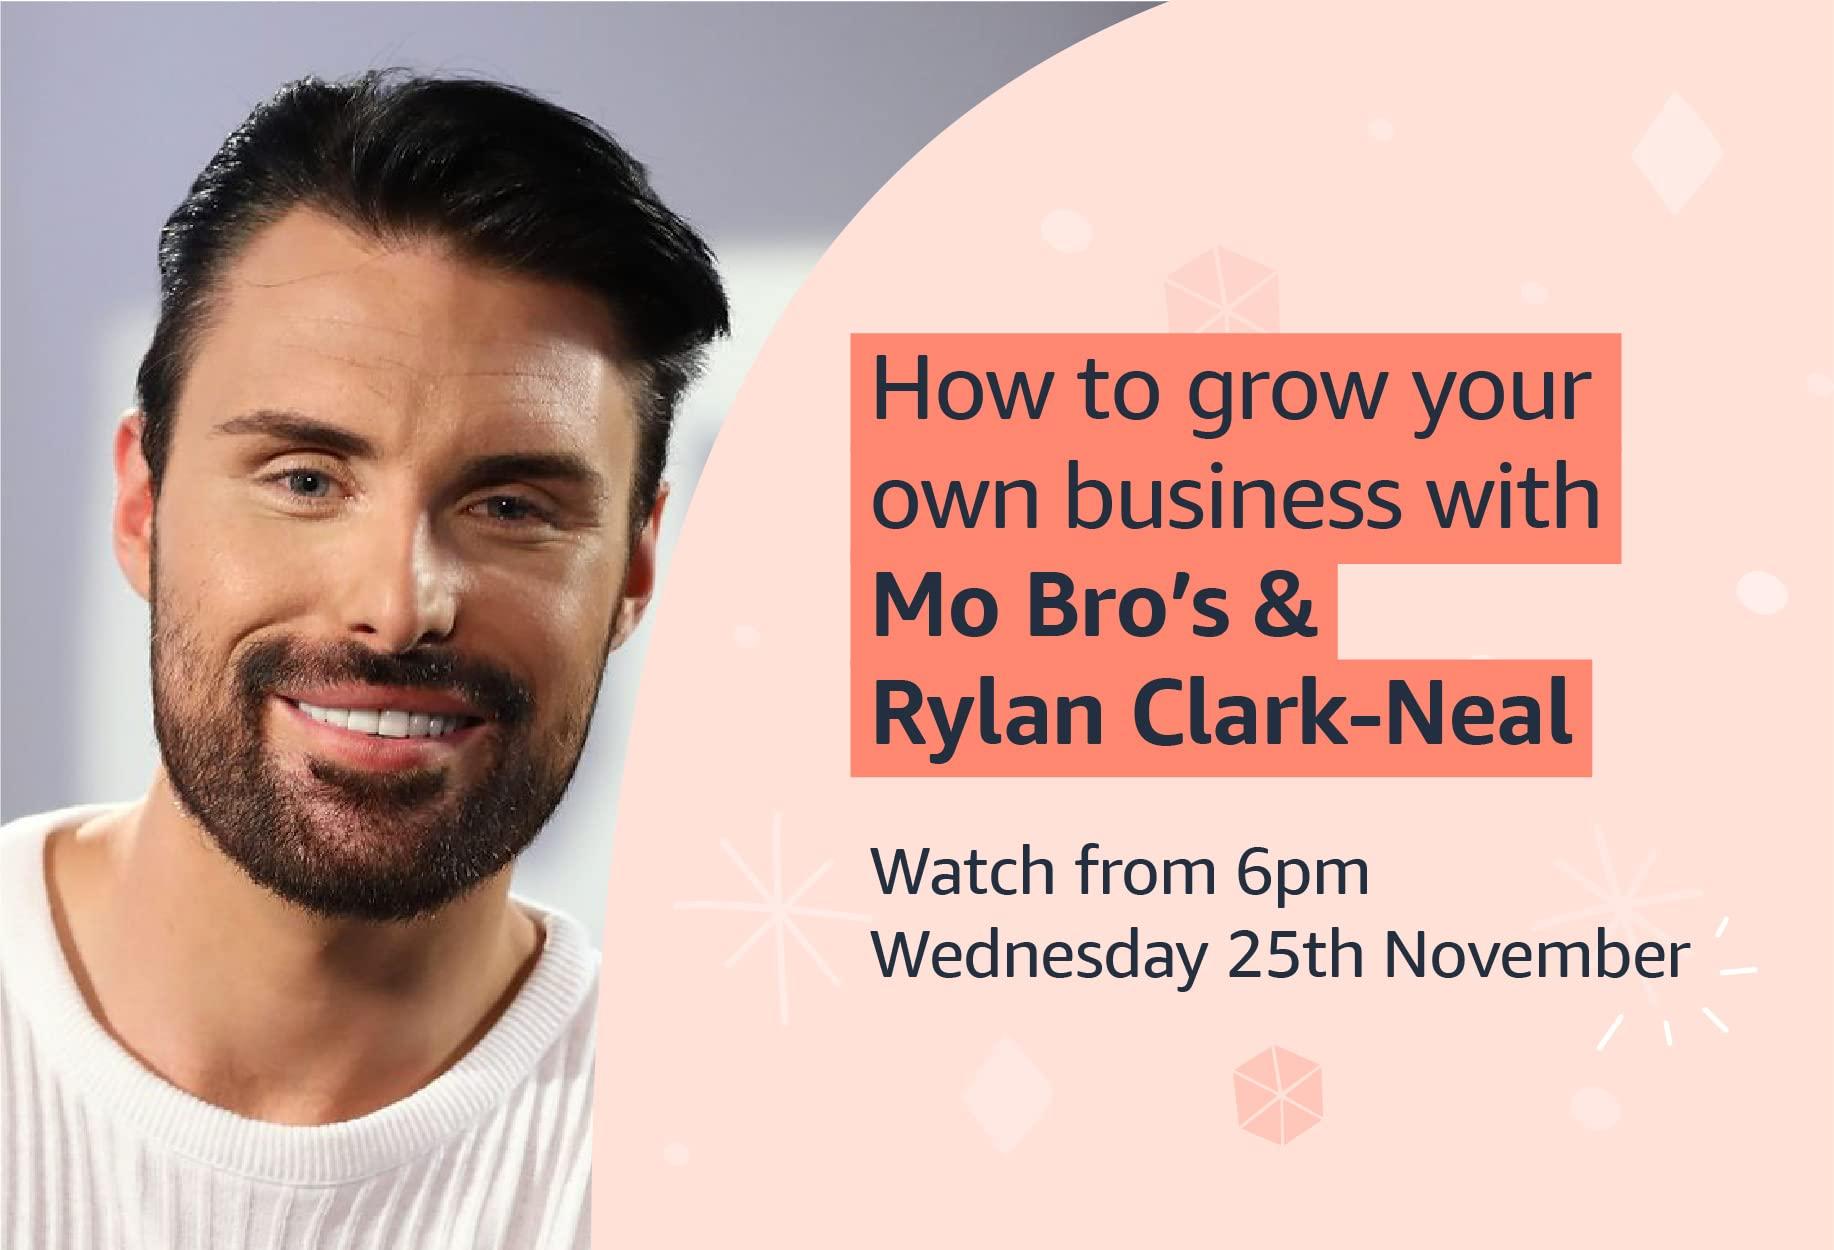 Mo Bro's & Rylan